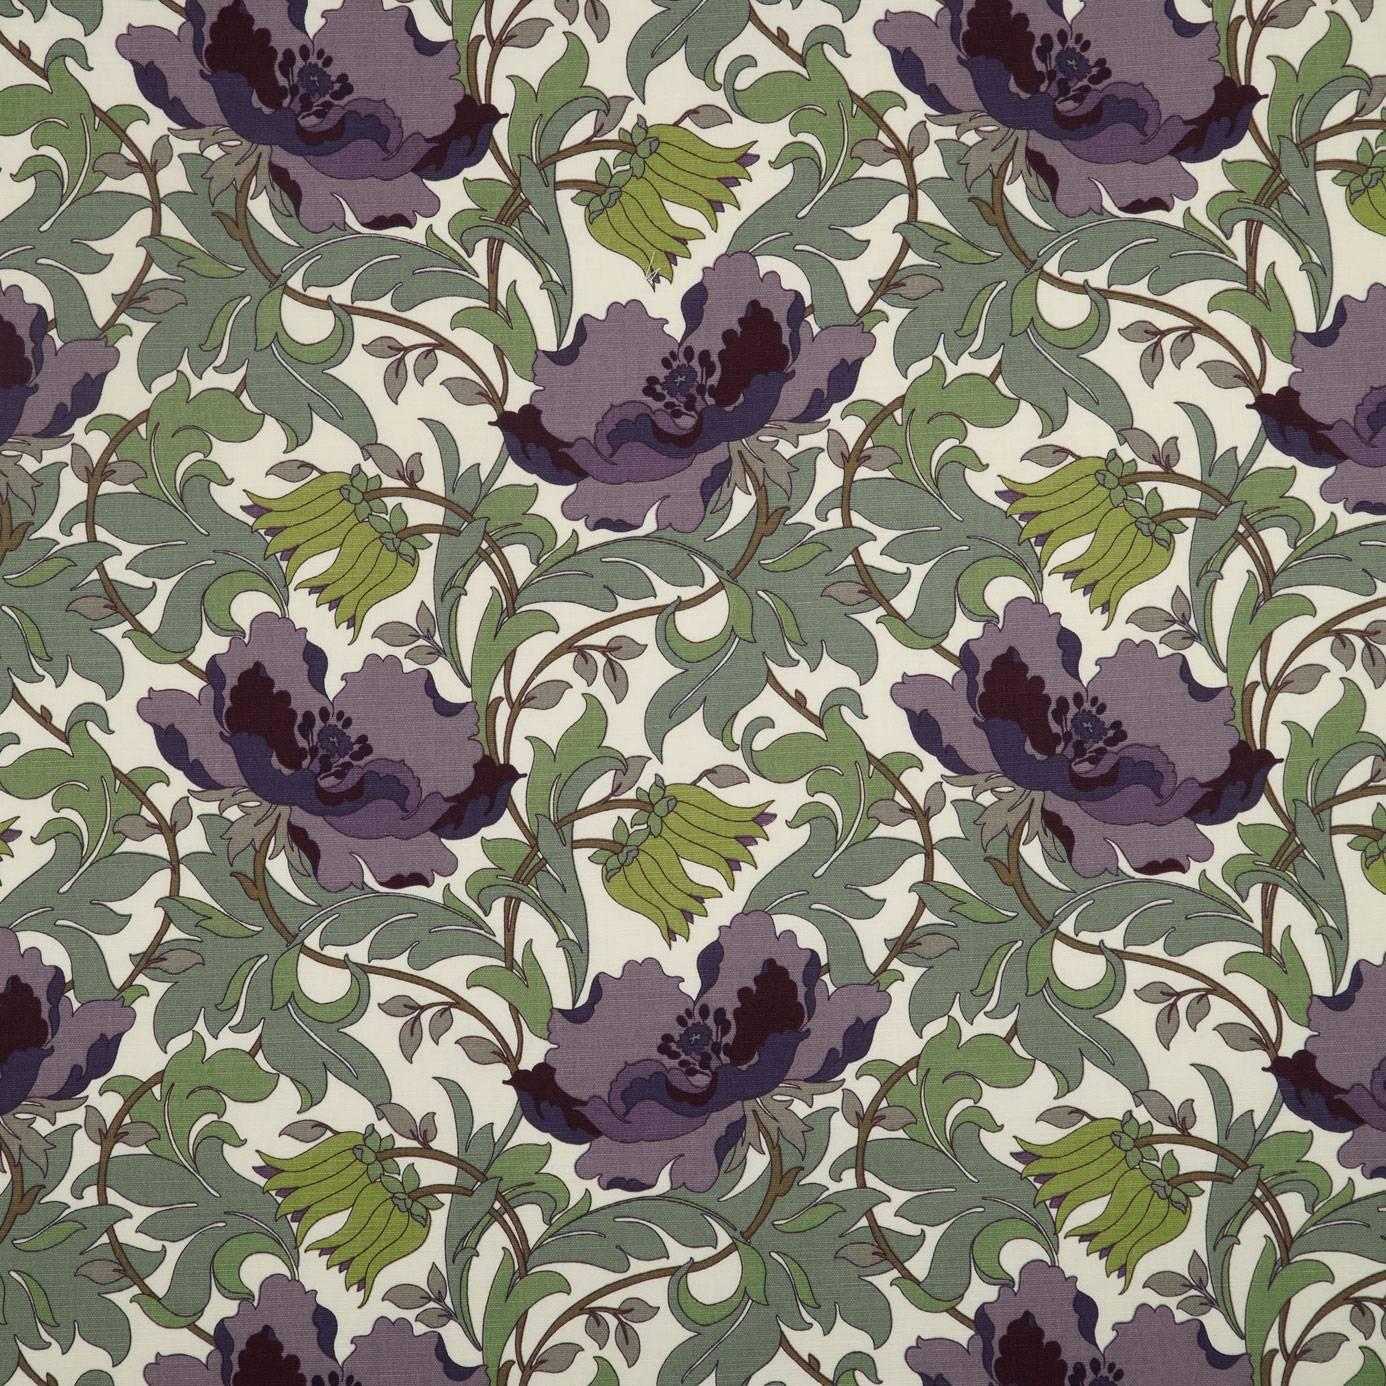 Home Fabrics iLiv Art Deco Berry Fabrics Wallpapers Art Deco Fabric 1386x1386